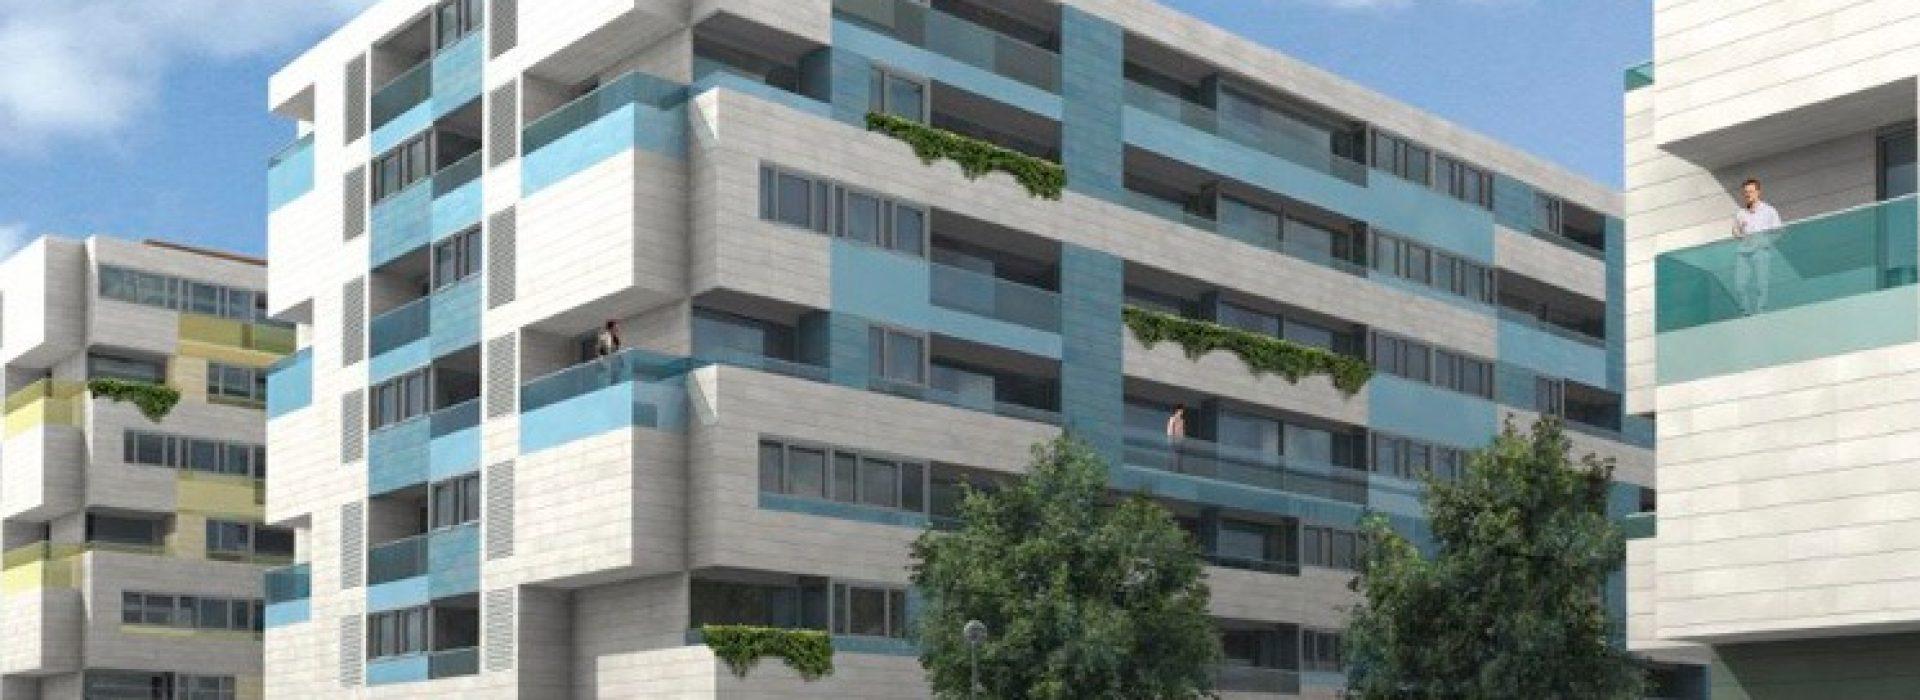 residencial-puerta-de-zaragoza-101-1